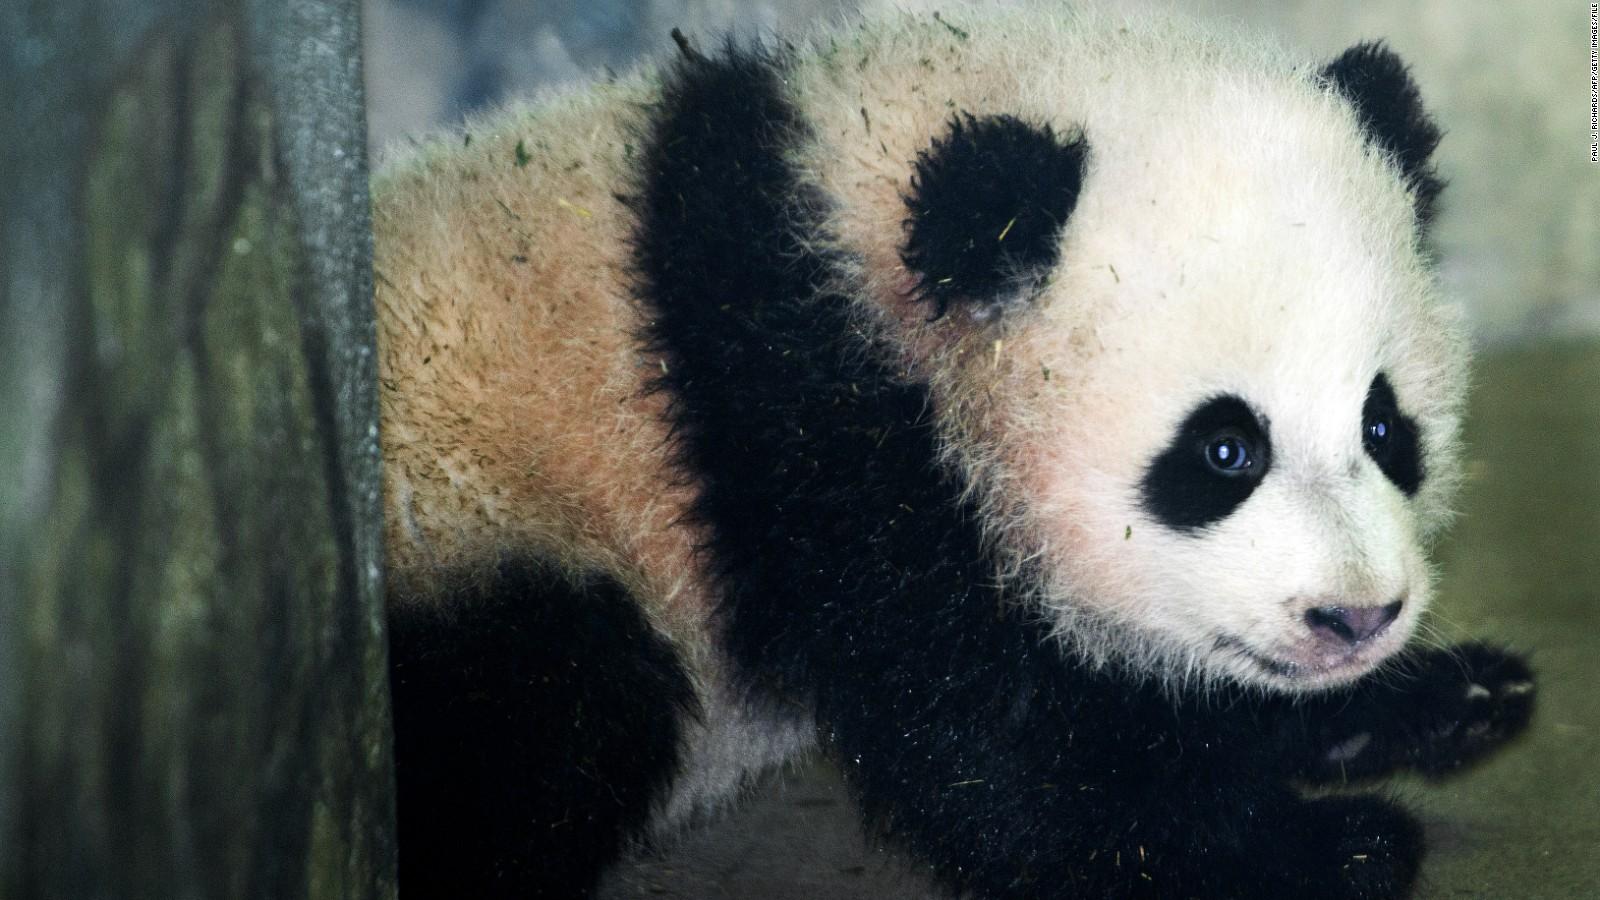 Paws crossed' for a healthy panda cub   CNN Travel